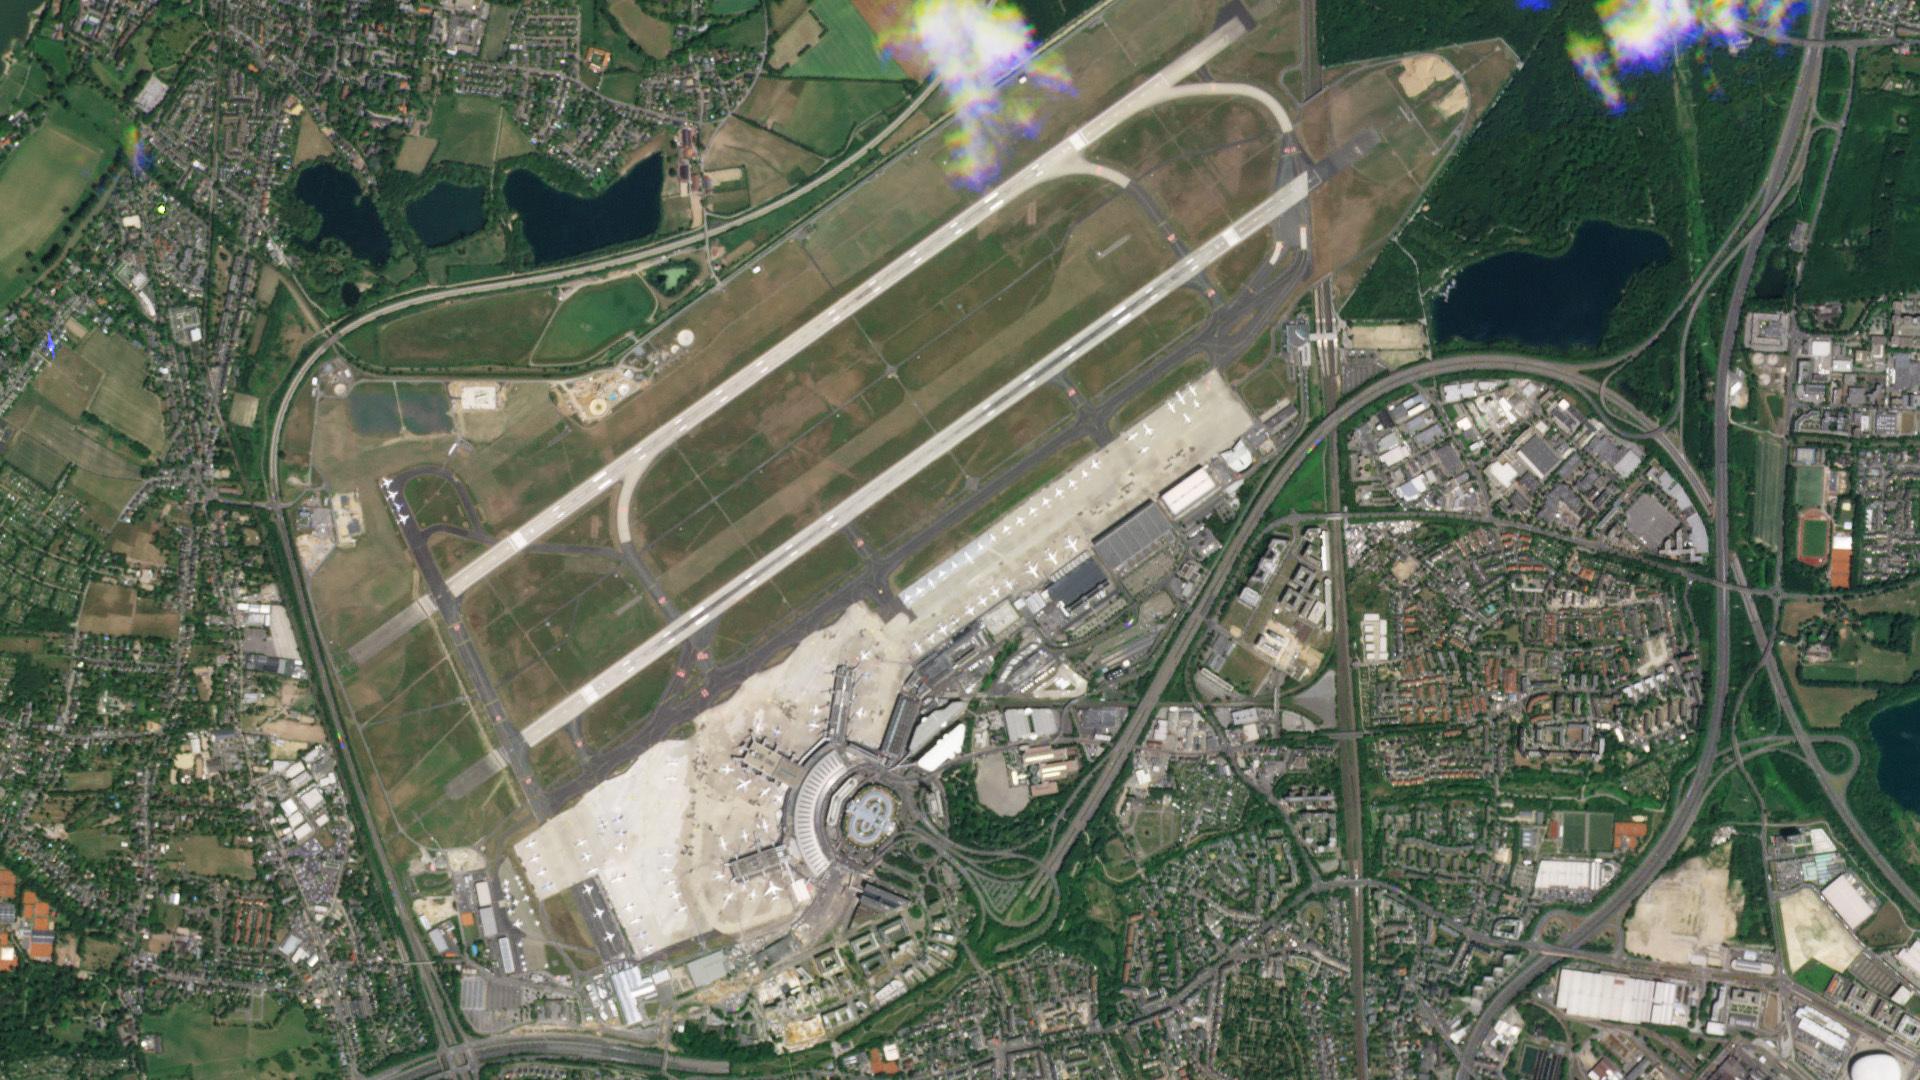 dusseldorf airport germany 20200620 106a rgb geo 1920.